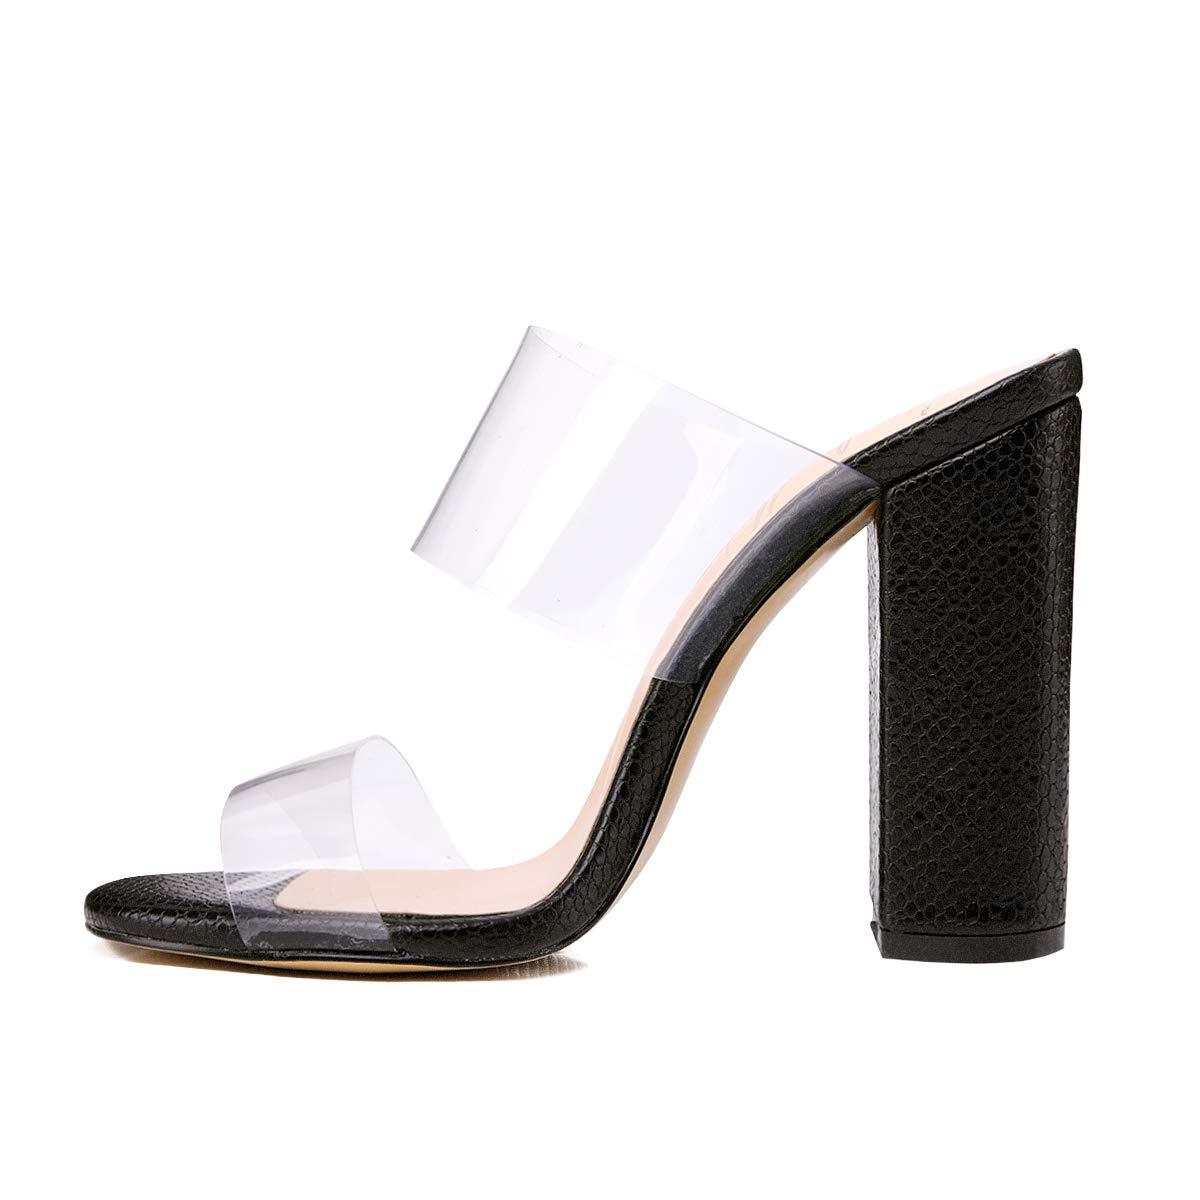 473cdd5cc358 Onlymaker Women s Clear Open Toe Double Straps Chunky Heels Mules Snake  Pattern High Heels Slip on Slide Sandals Black 8 M US